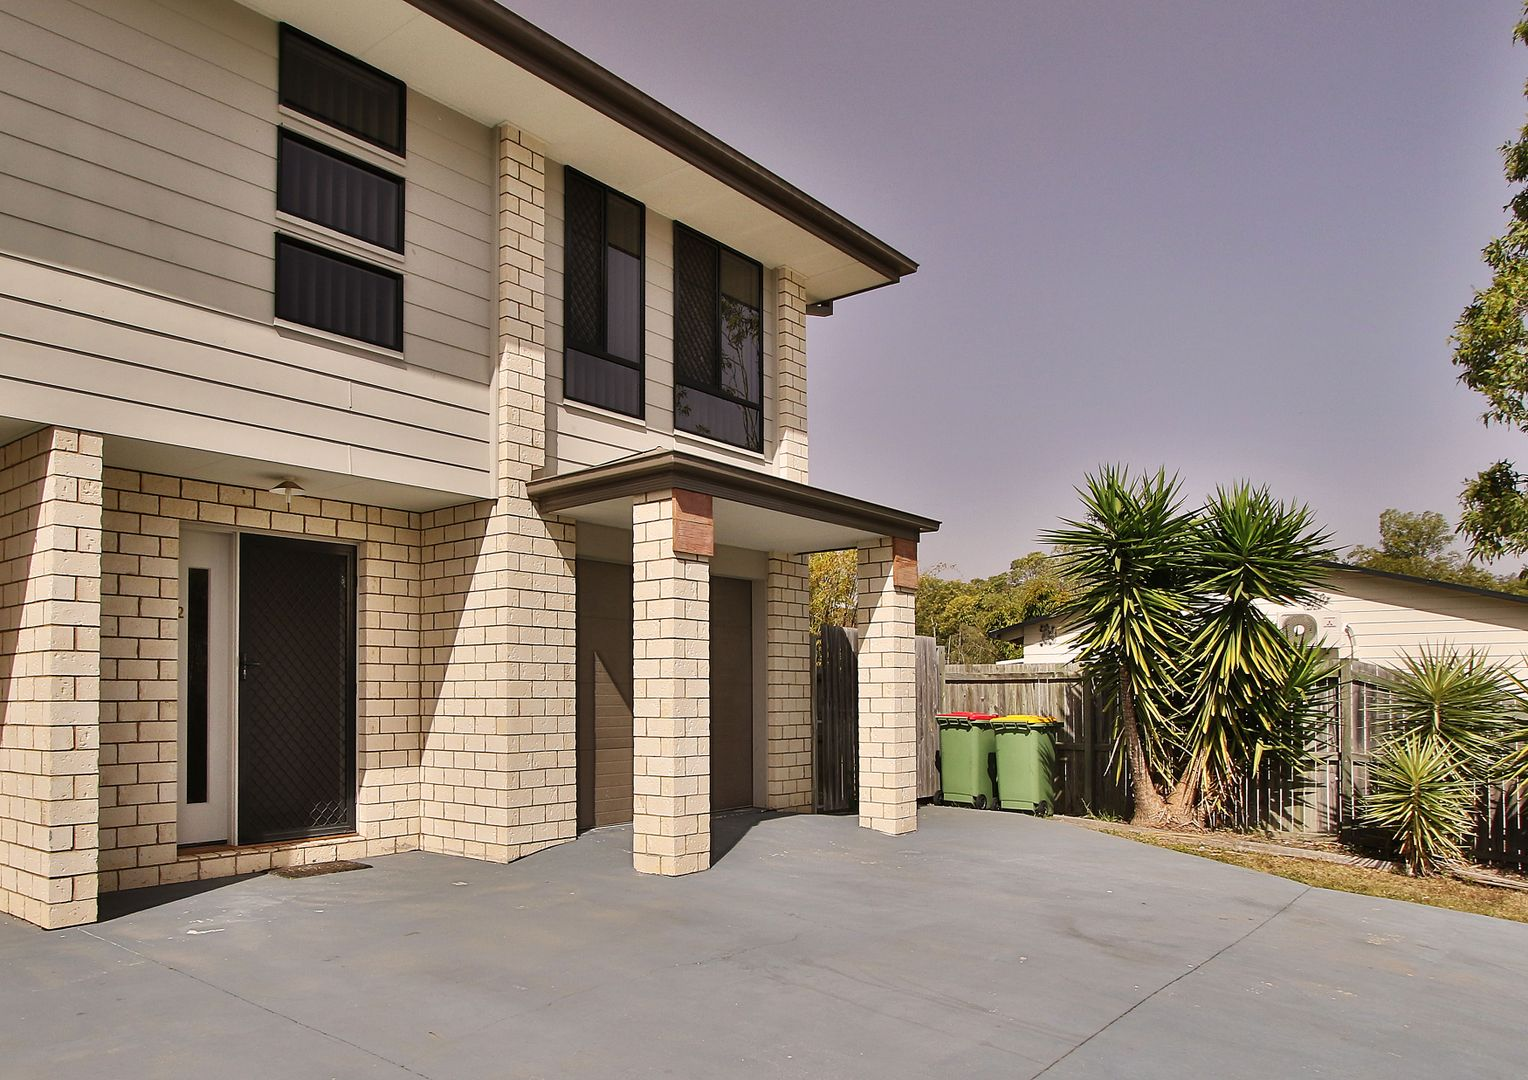 2/270 EAGLE STREET, Collingwood Park QLD 4301, Image 0